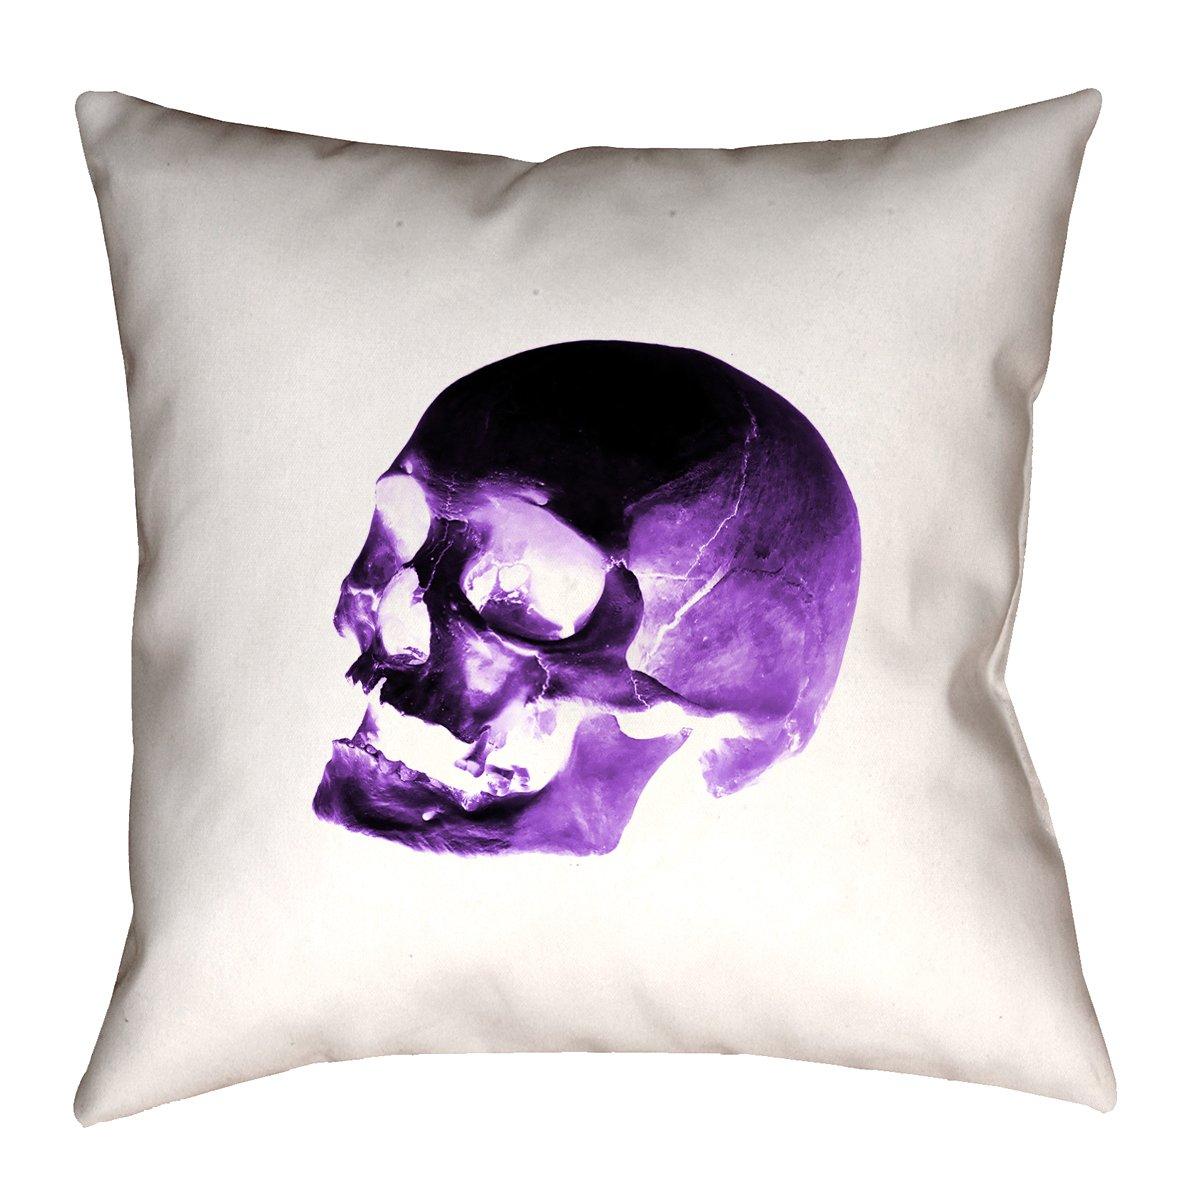 ArtVerse Katelyn Smith 36' x 36' Floor Double Sided Print with Concealed Zipper & Insert Purple & Black Skull Pillow SMI030F3636L